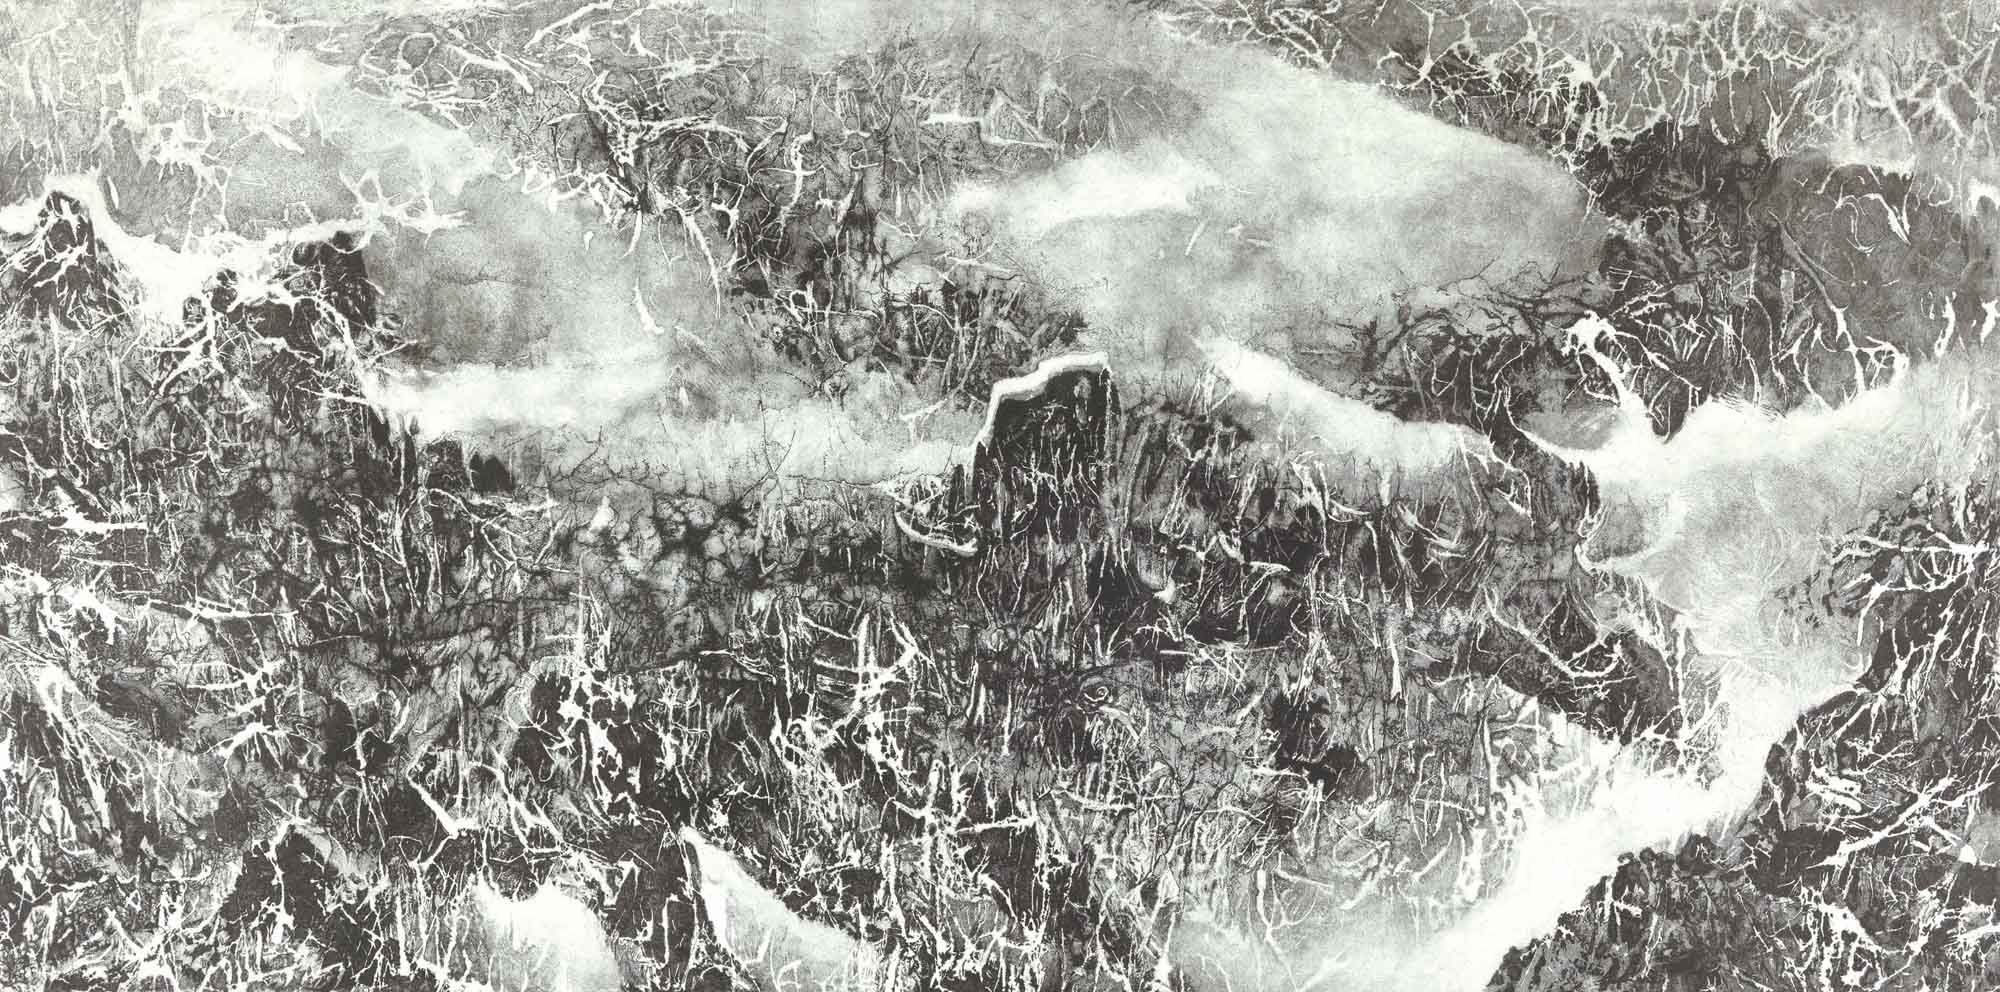 劉國松 LIU Kuo-Sung〈雲樹銀枝 Silvery Woods amidst Cloudy Mountains〉